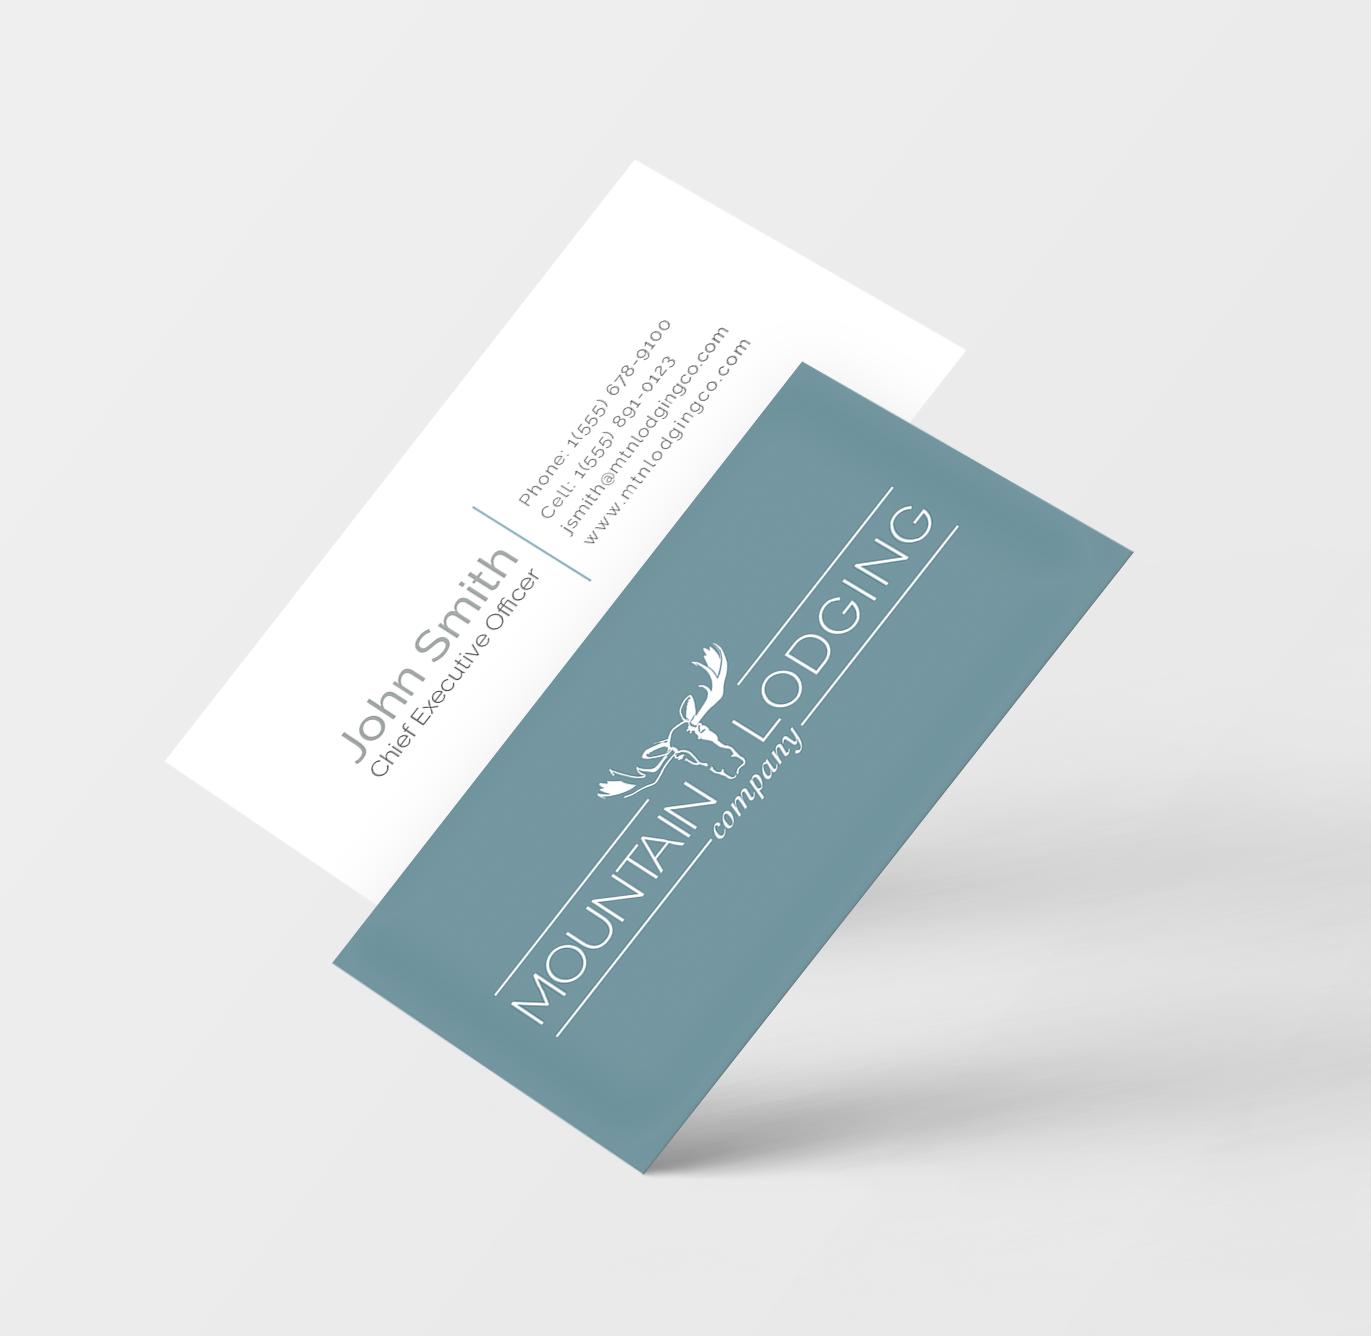 Mtn_Lodging_Business Card Mockup